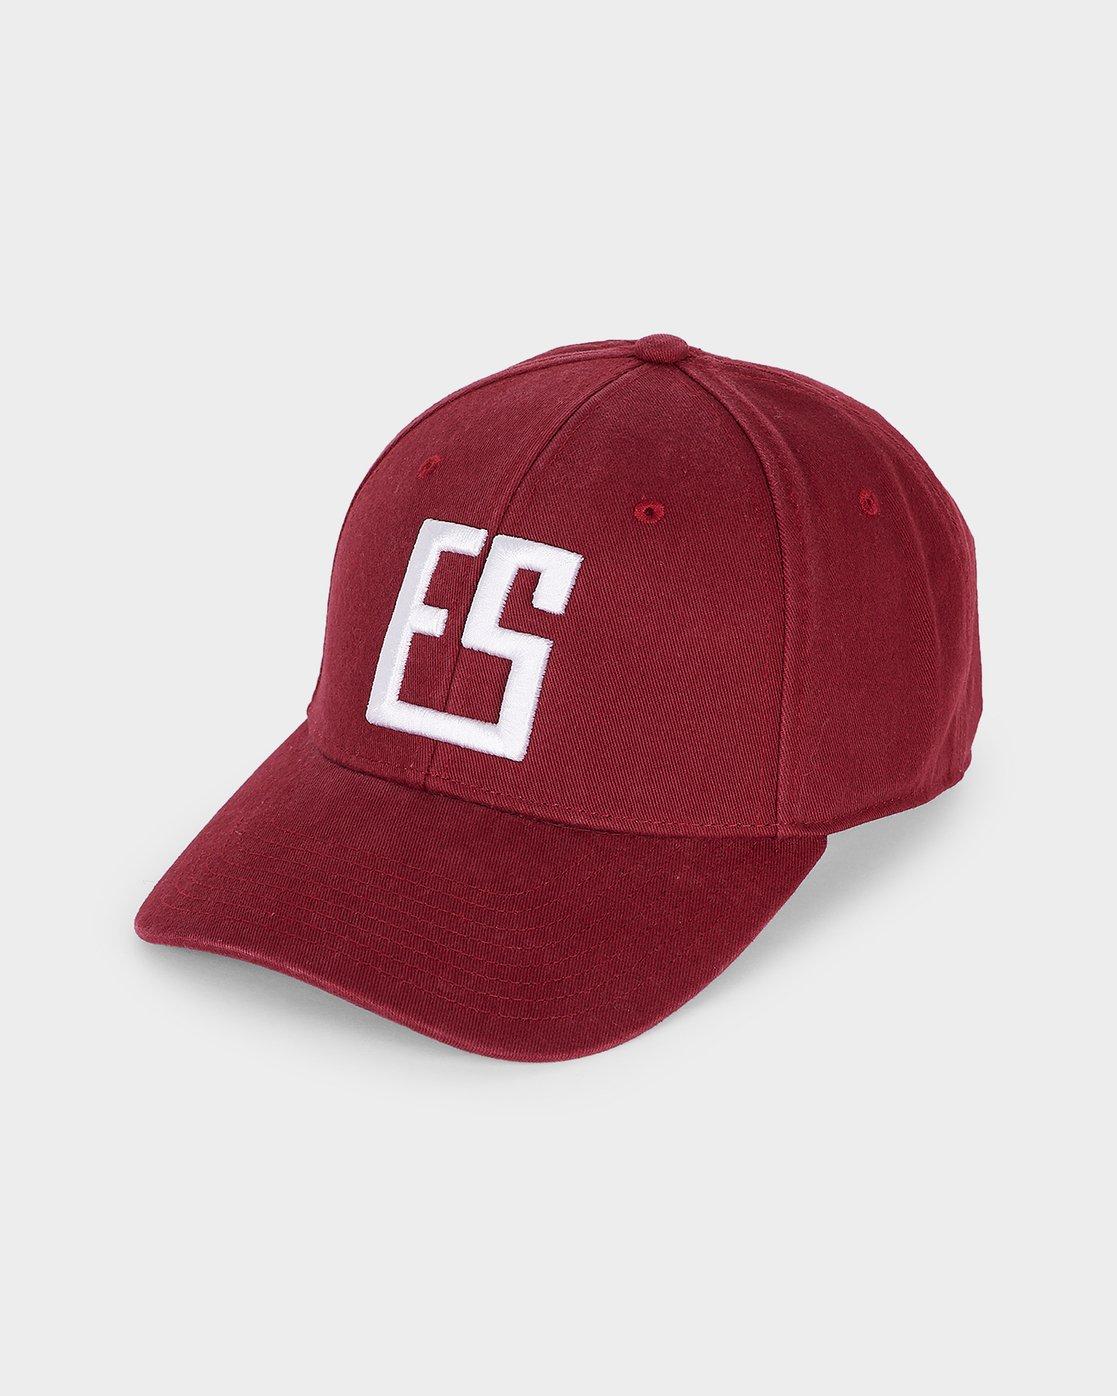 2 ELEMENT SKATE CAP  283604 Element